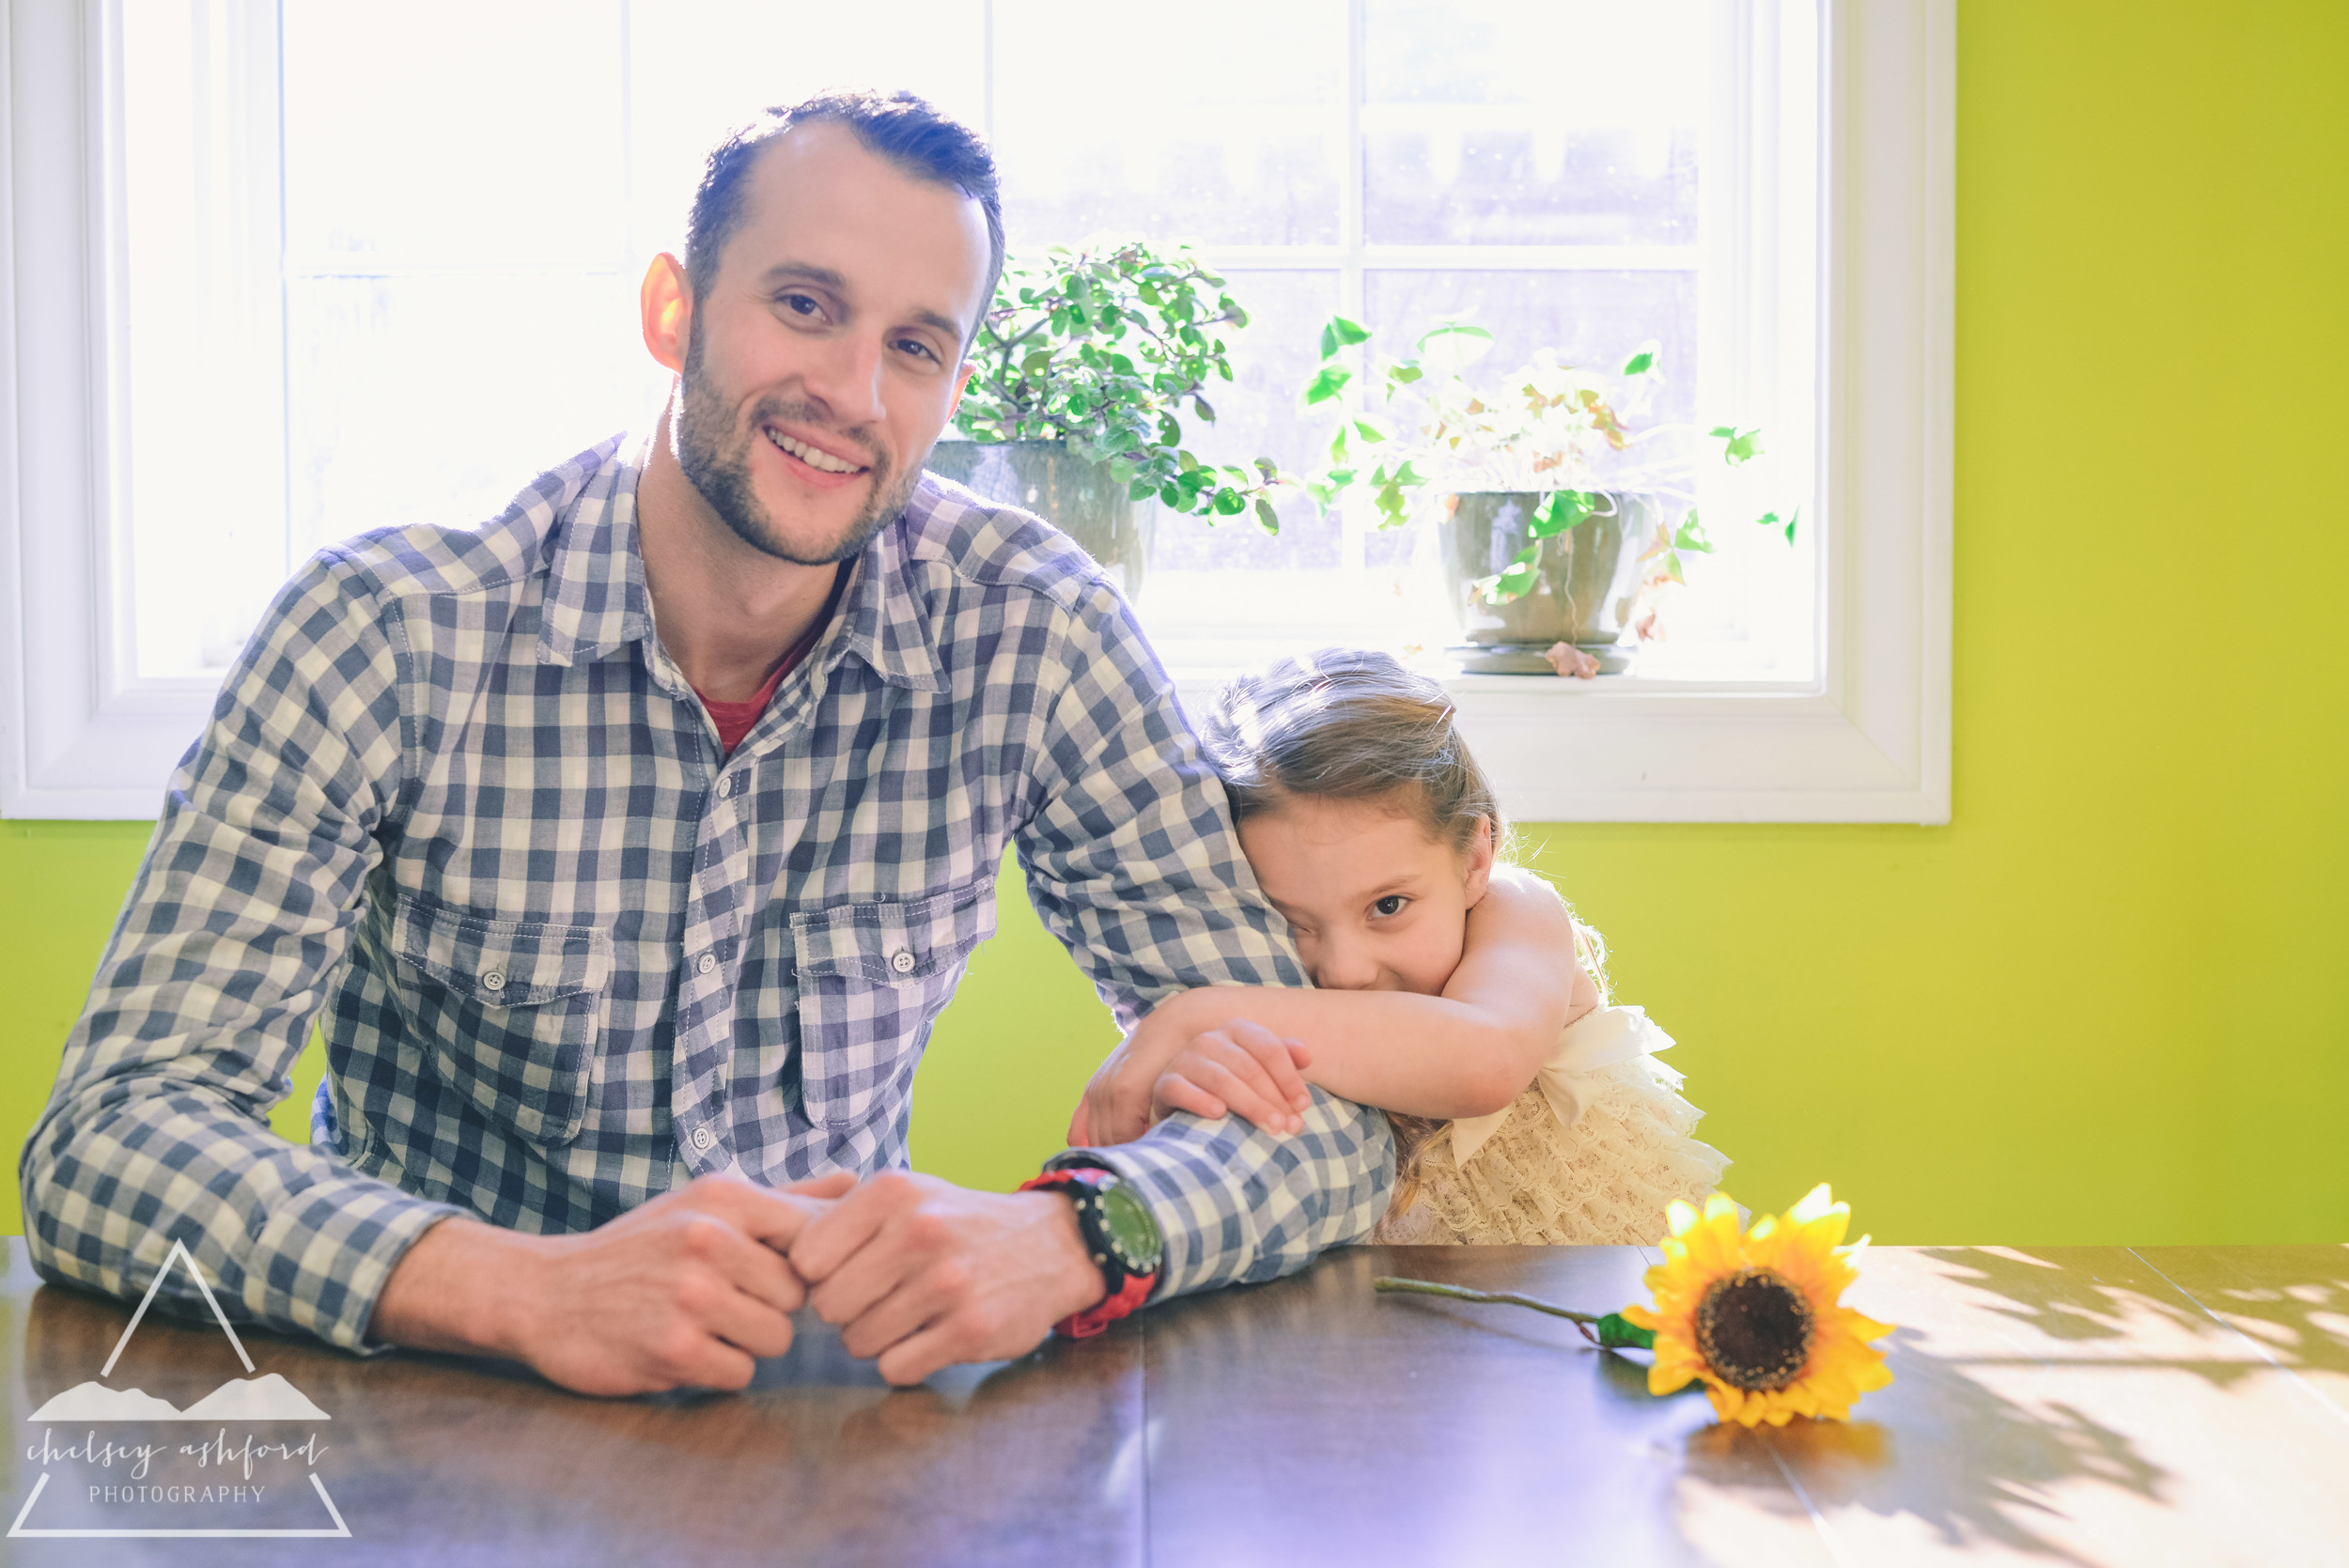 Tyler_Honor_portraits_web-20.jpg